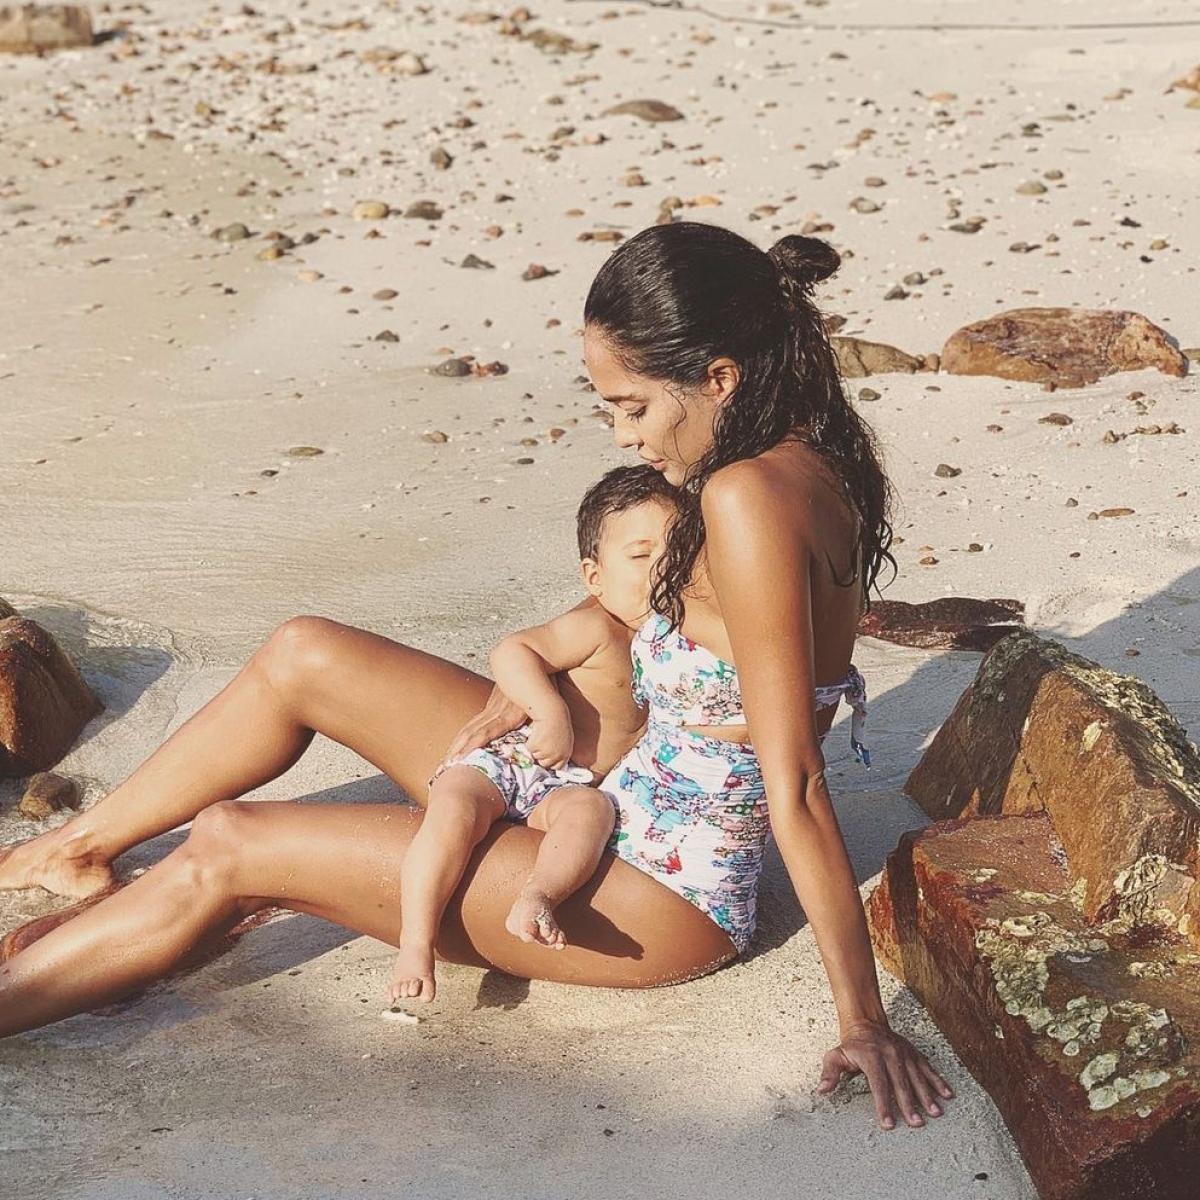 Lisa Haydon expecting third child with husband Dino Lalvani, reveals baby's gender